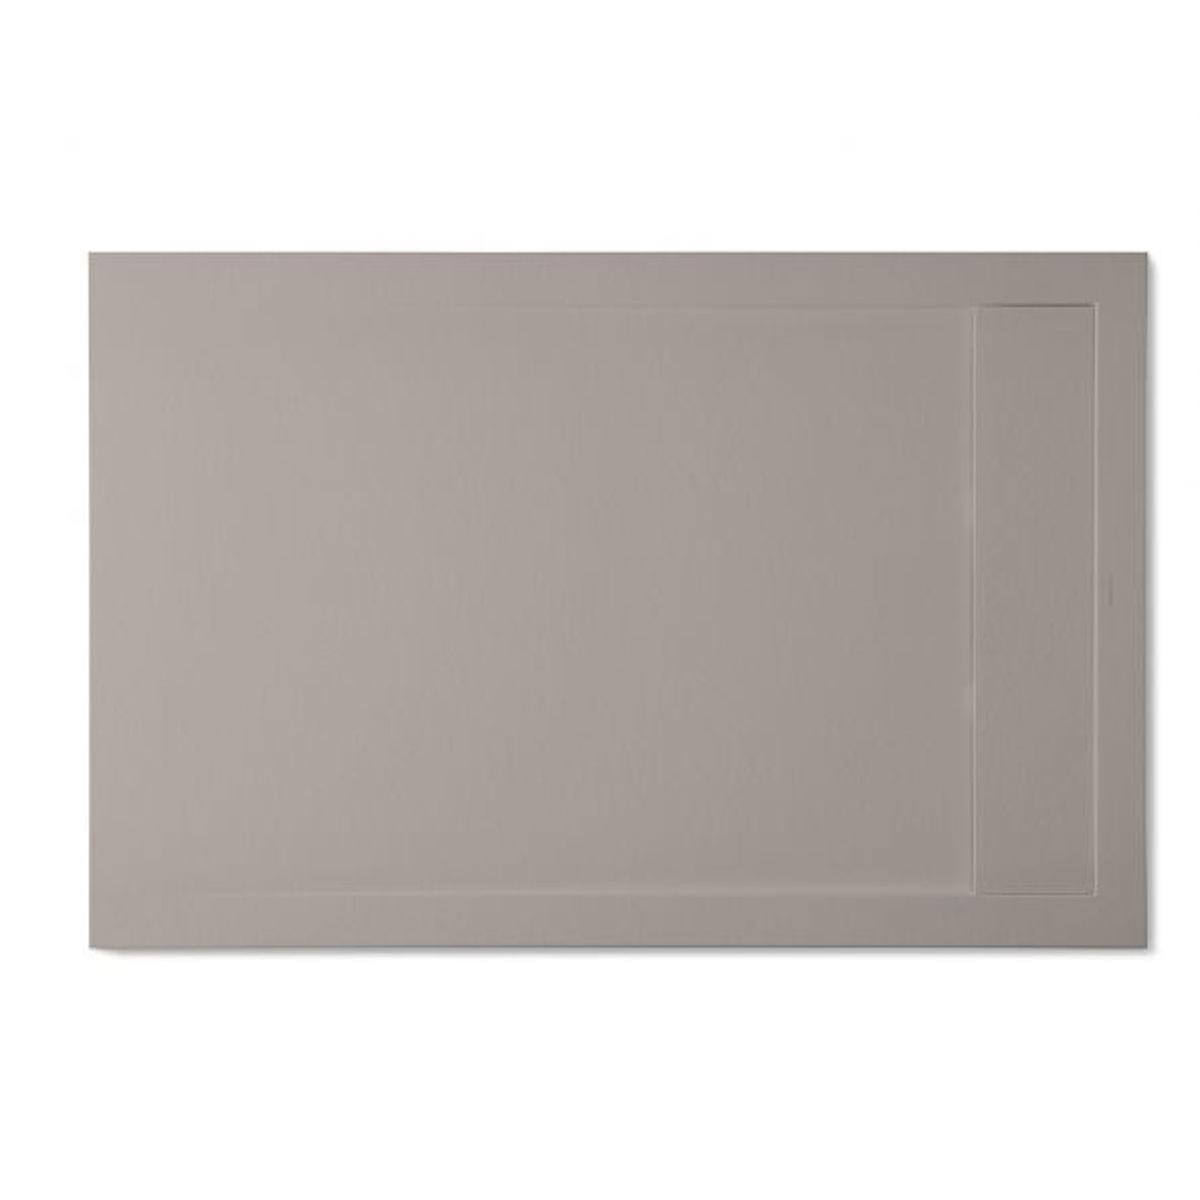 Plato de ducha rectangular 100x80 Andrómeda Stone Cover Fango